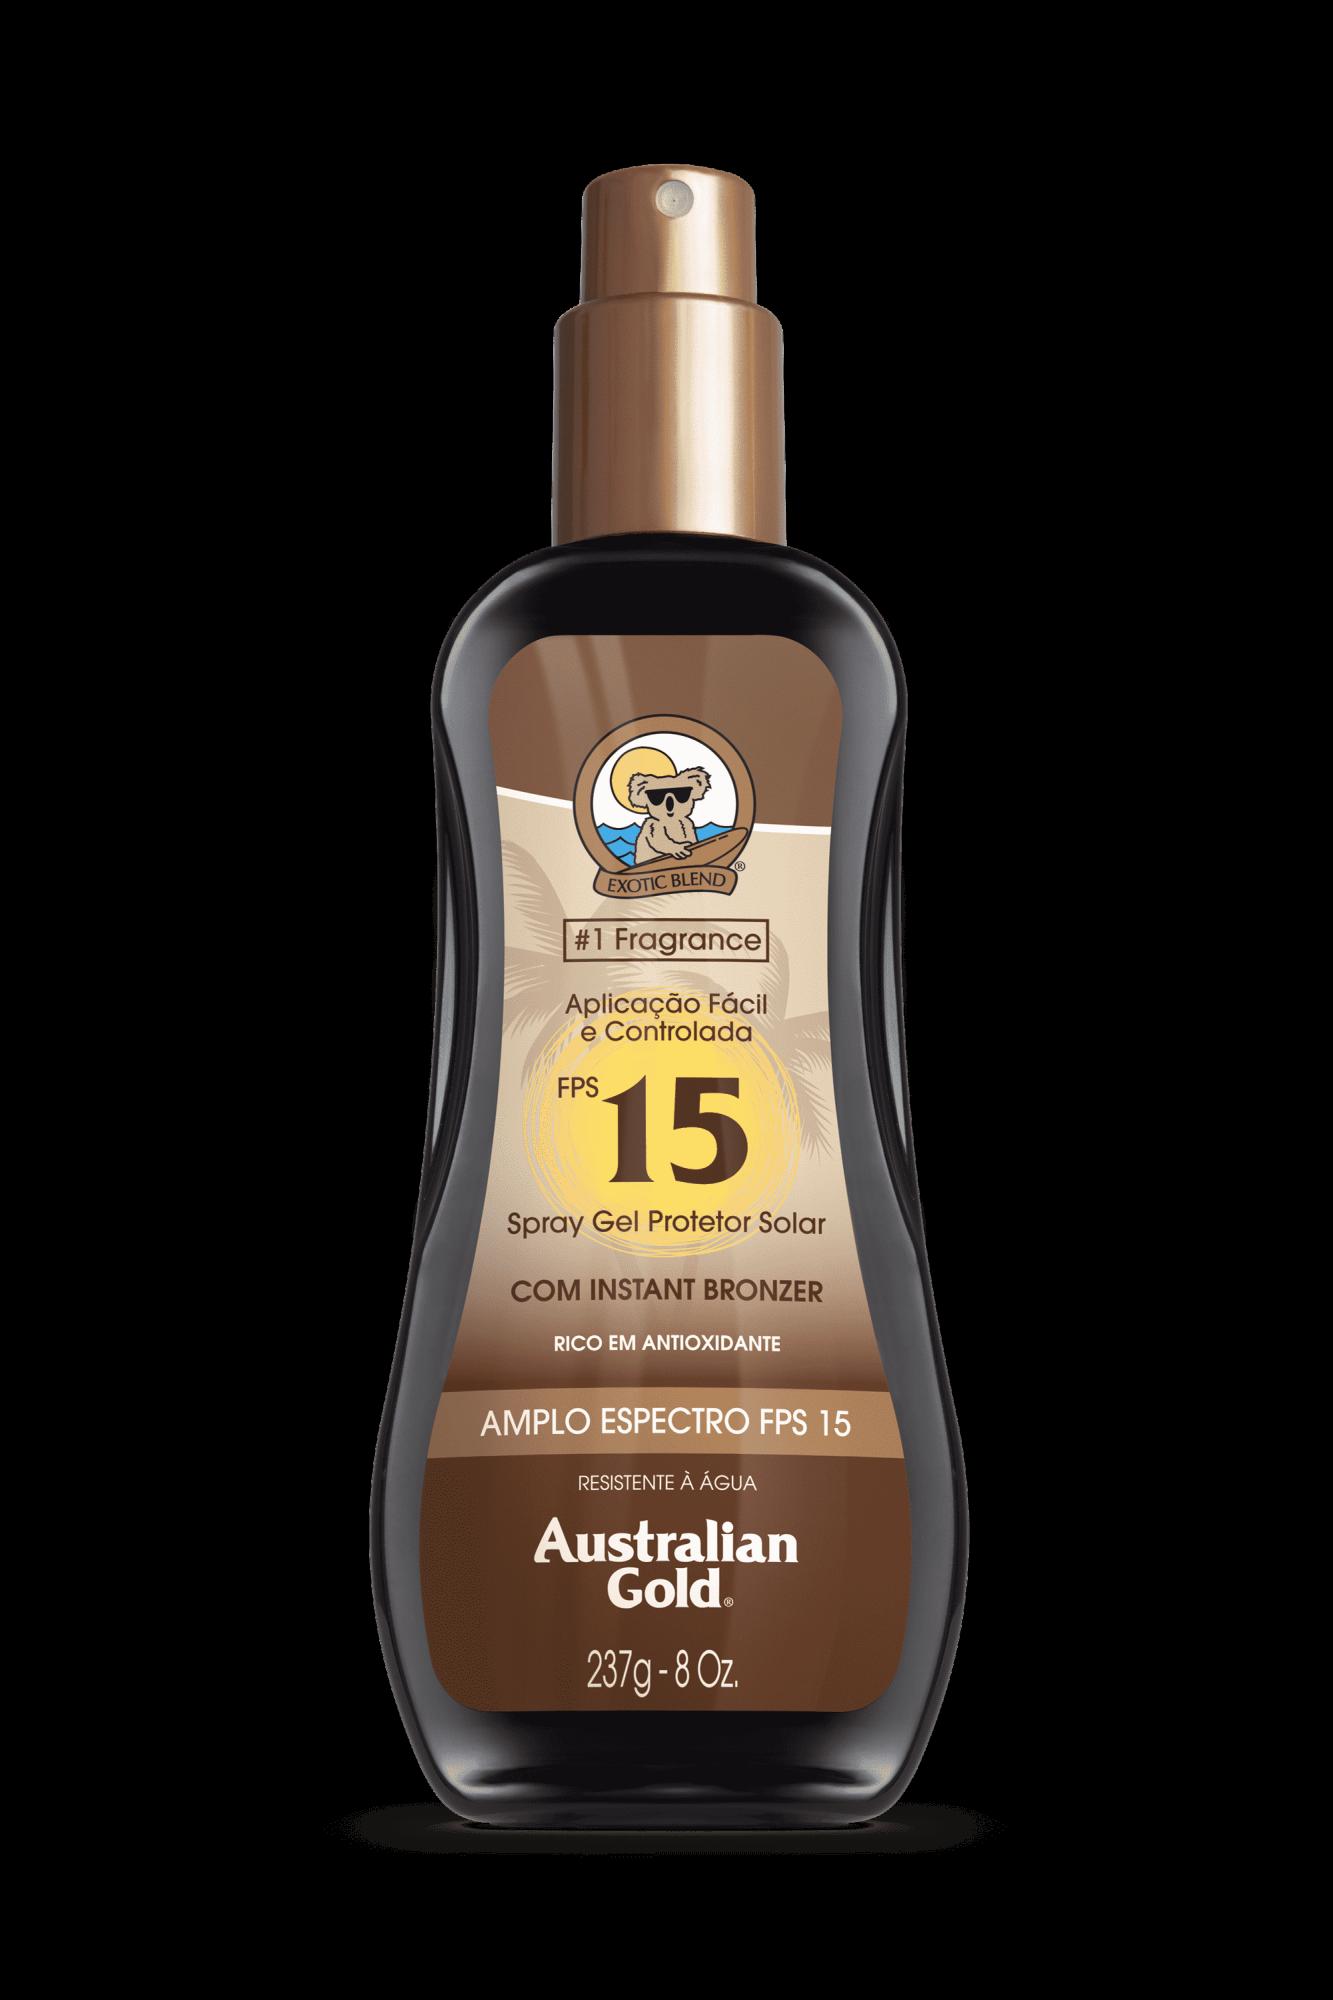 Australian Gold Protetor Solar Spray Gel com Instant Bronzer FPS 15 237gr